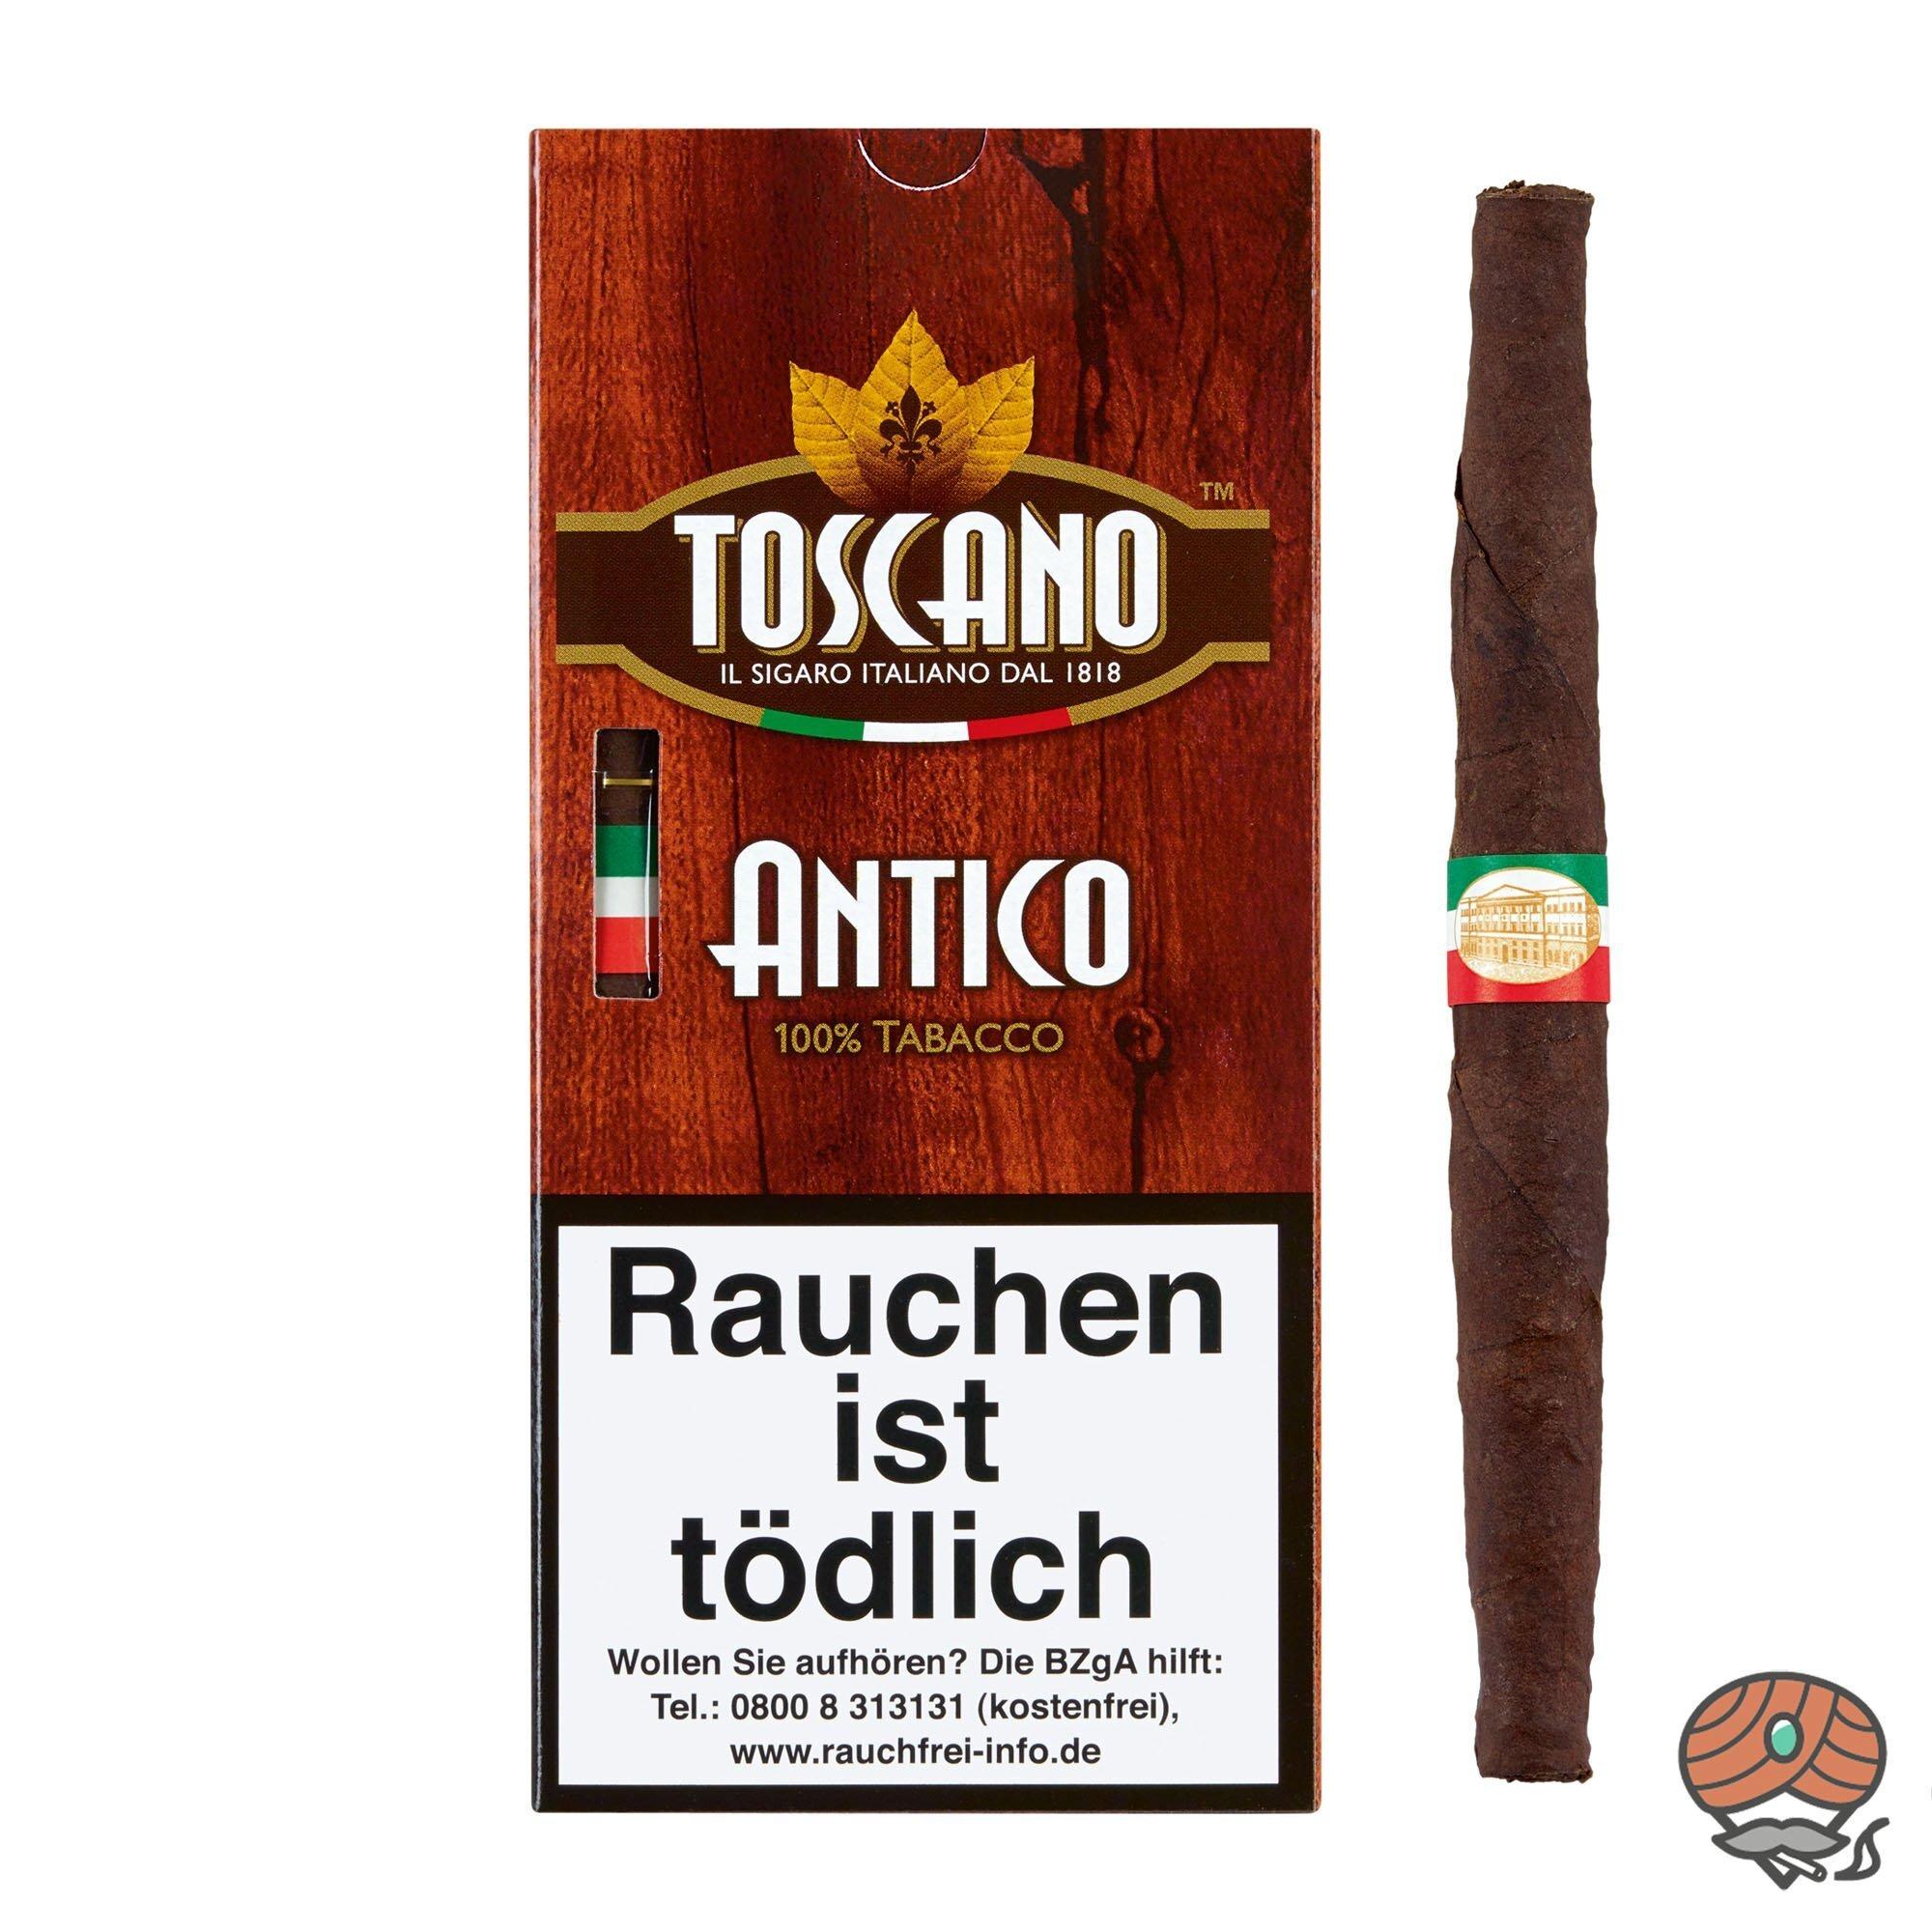 Toscano Antico 100% Tabacco Zigarren Inhalt 5 Stück